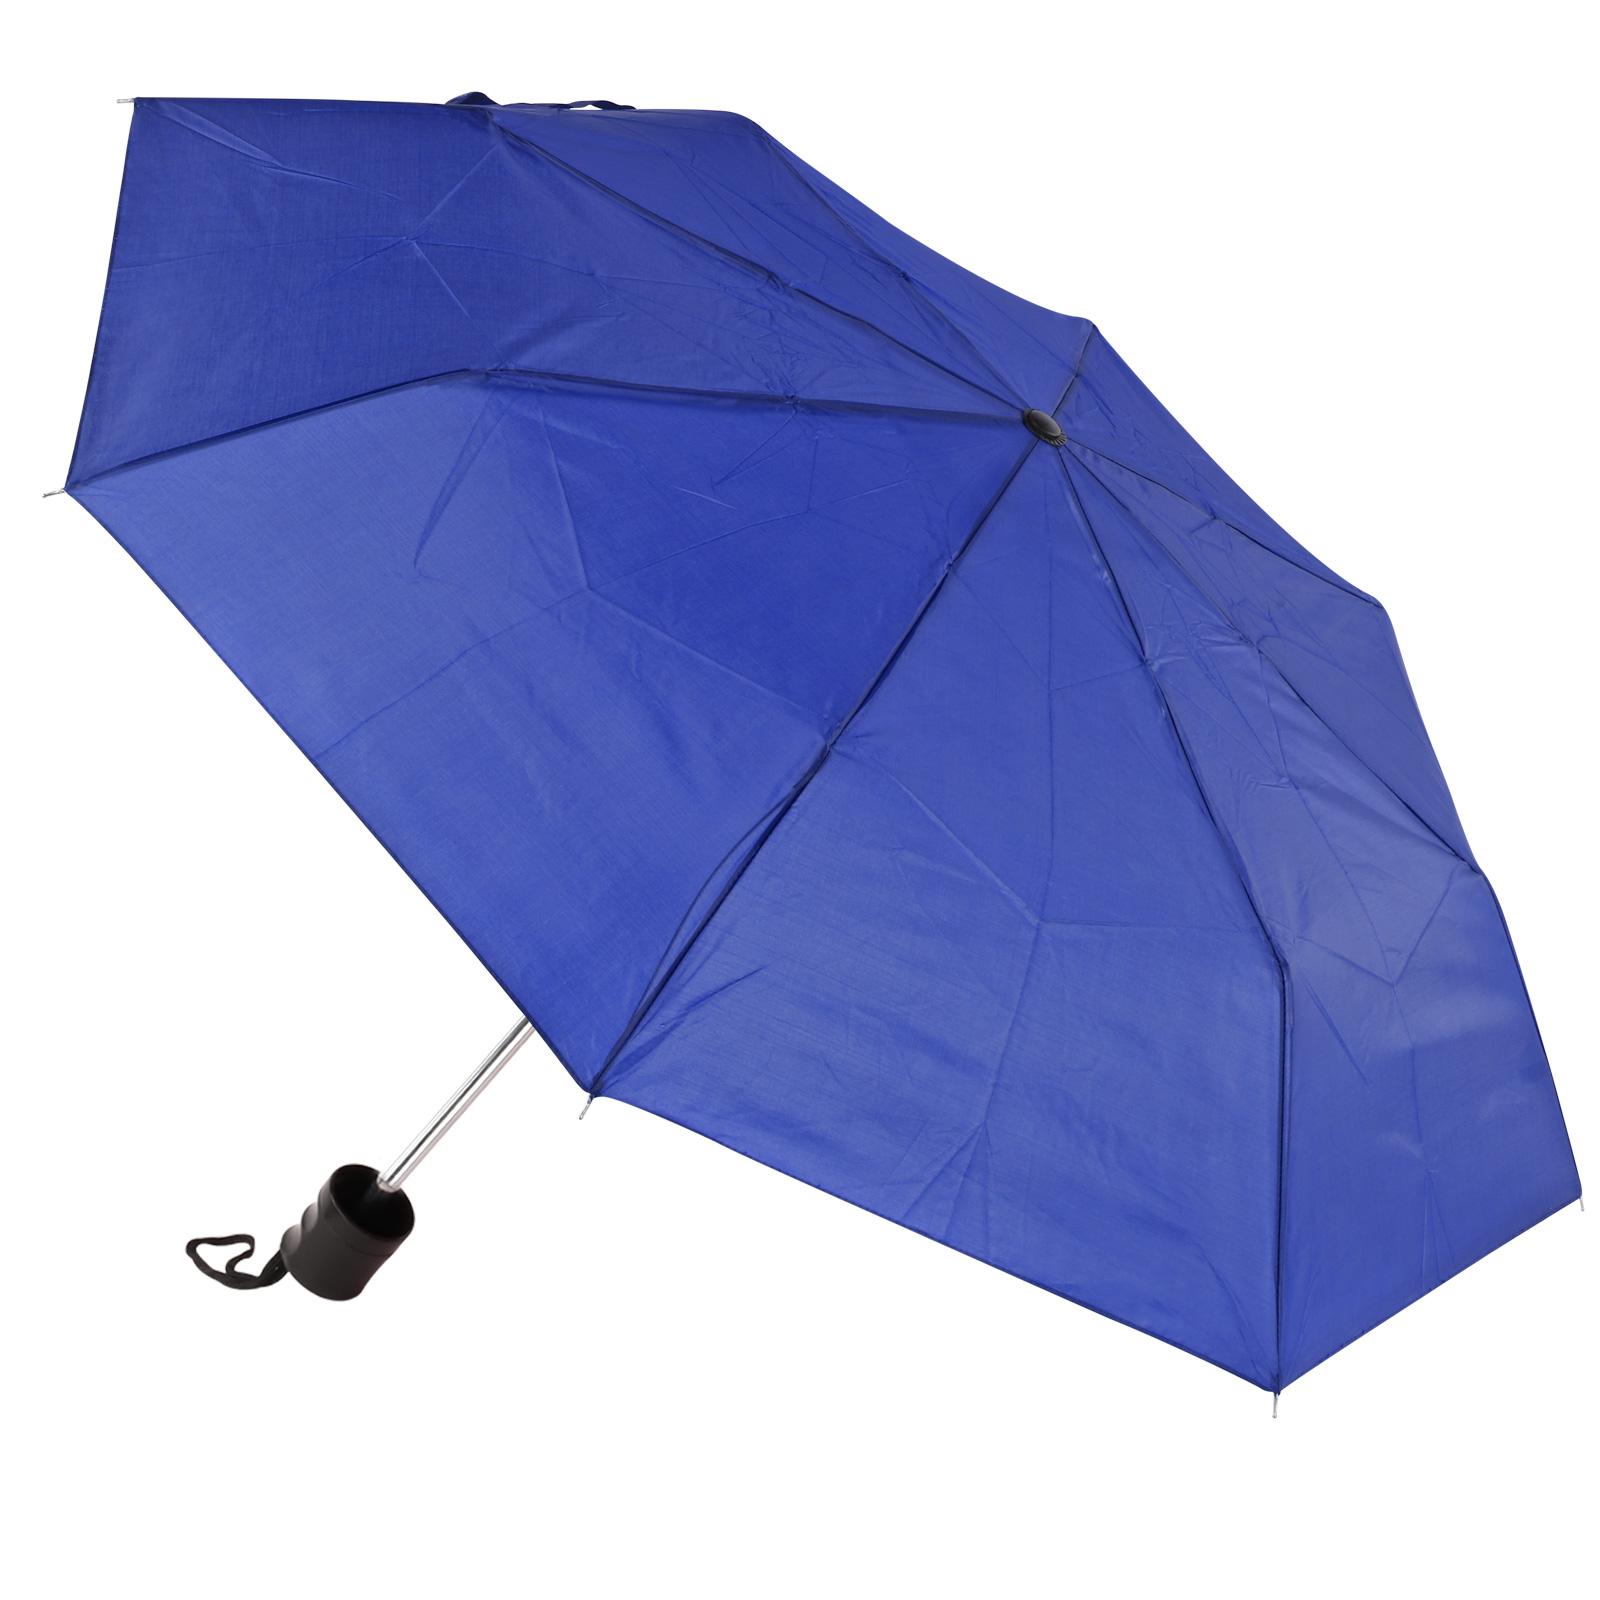 Amrini Regenschirm Blau 100cm Spannweite Mini Packmaß 25x5cm